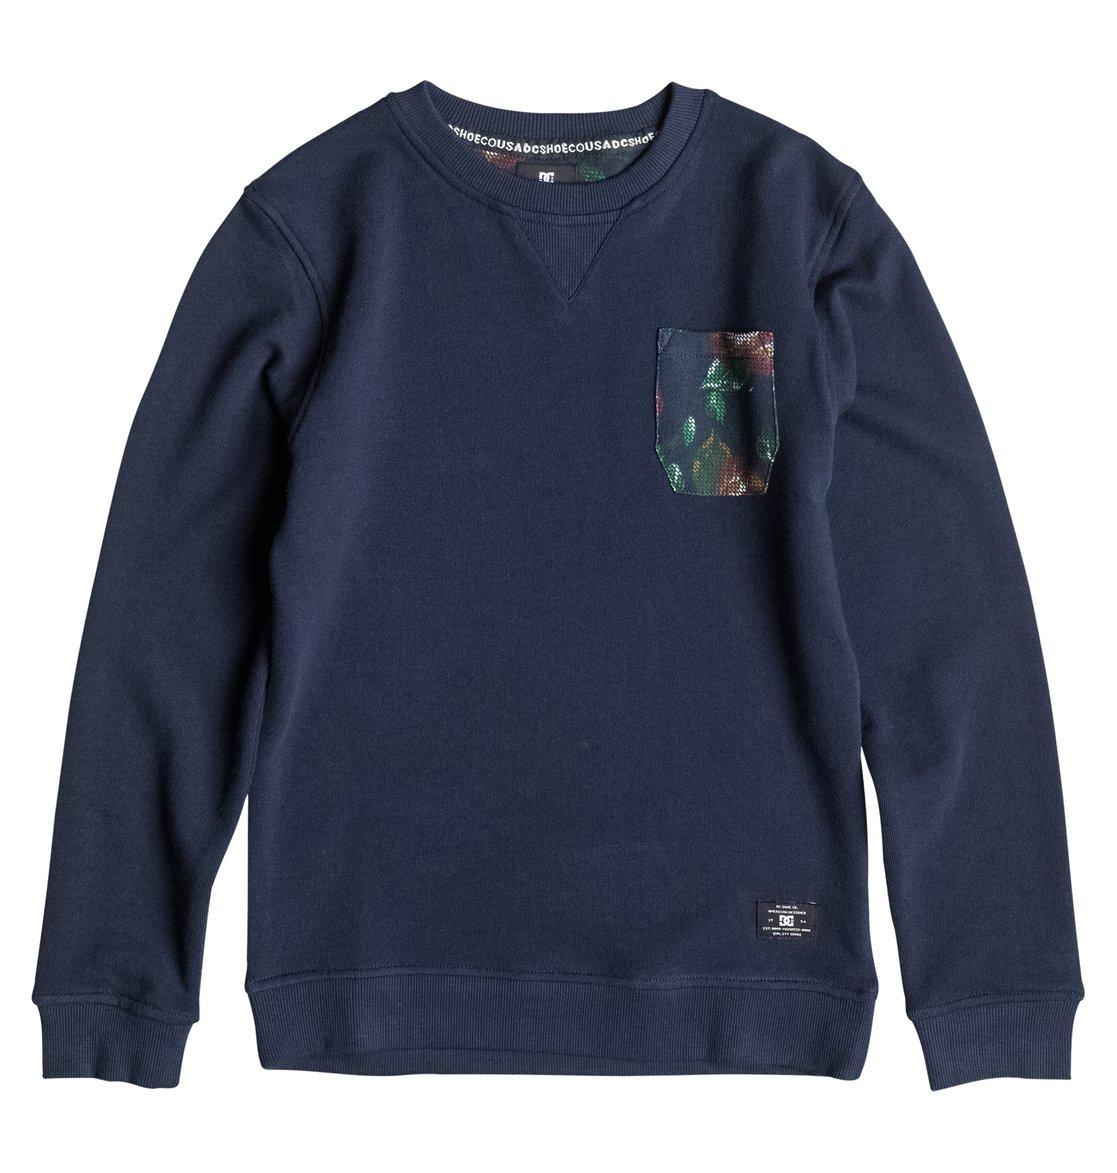 Bellingham Sweatshirt